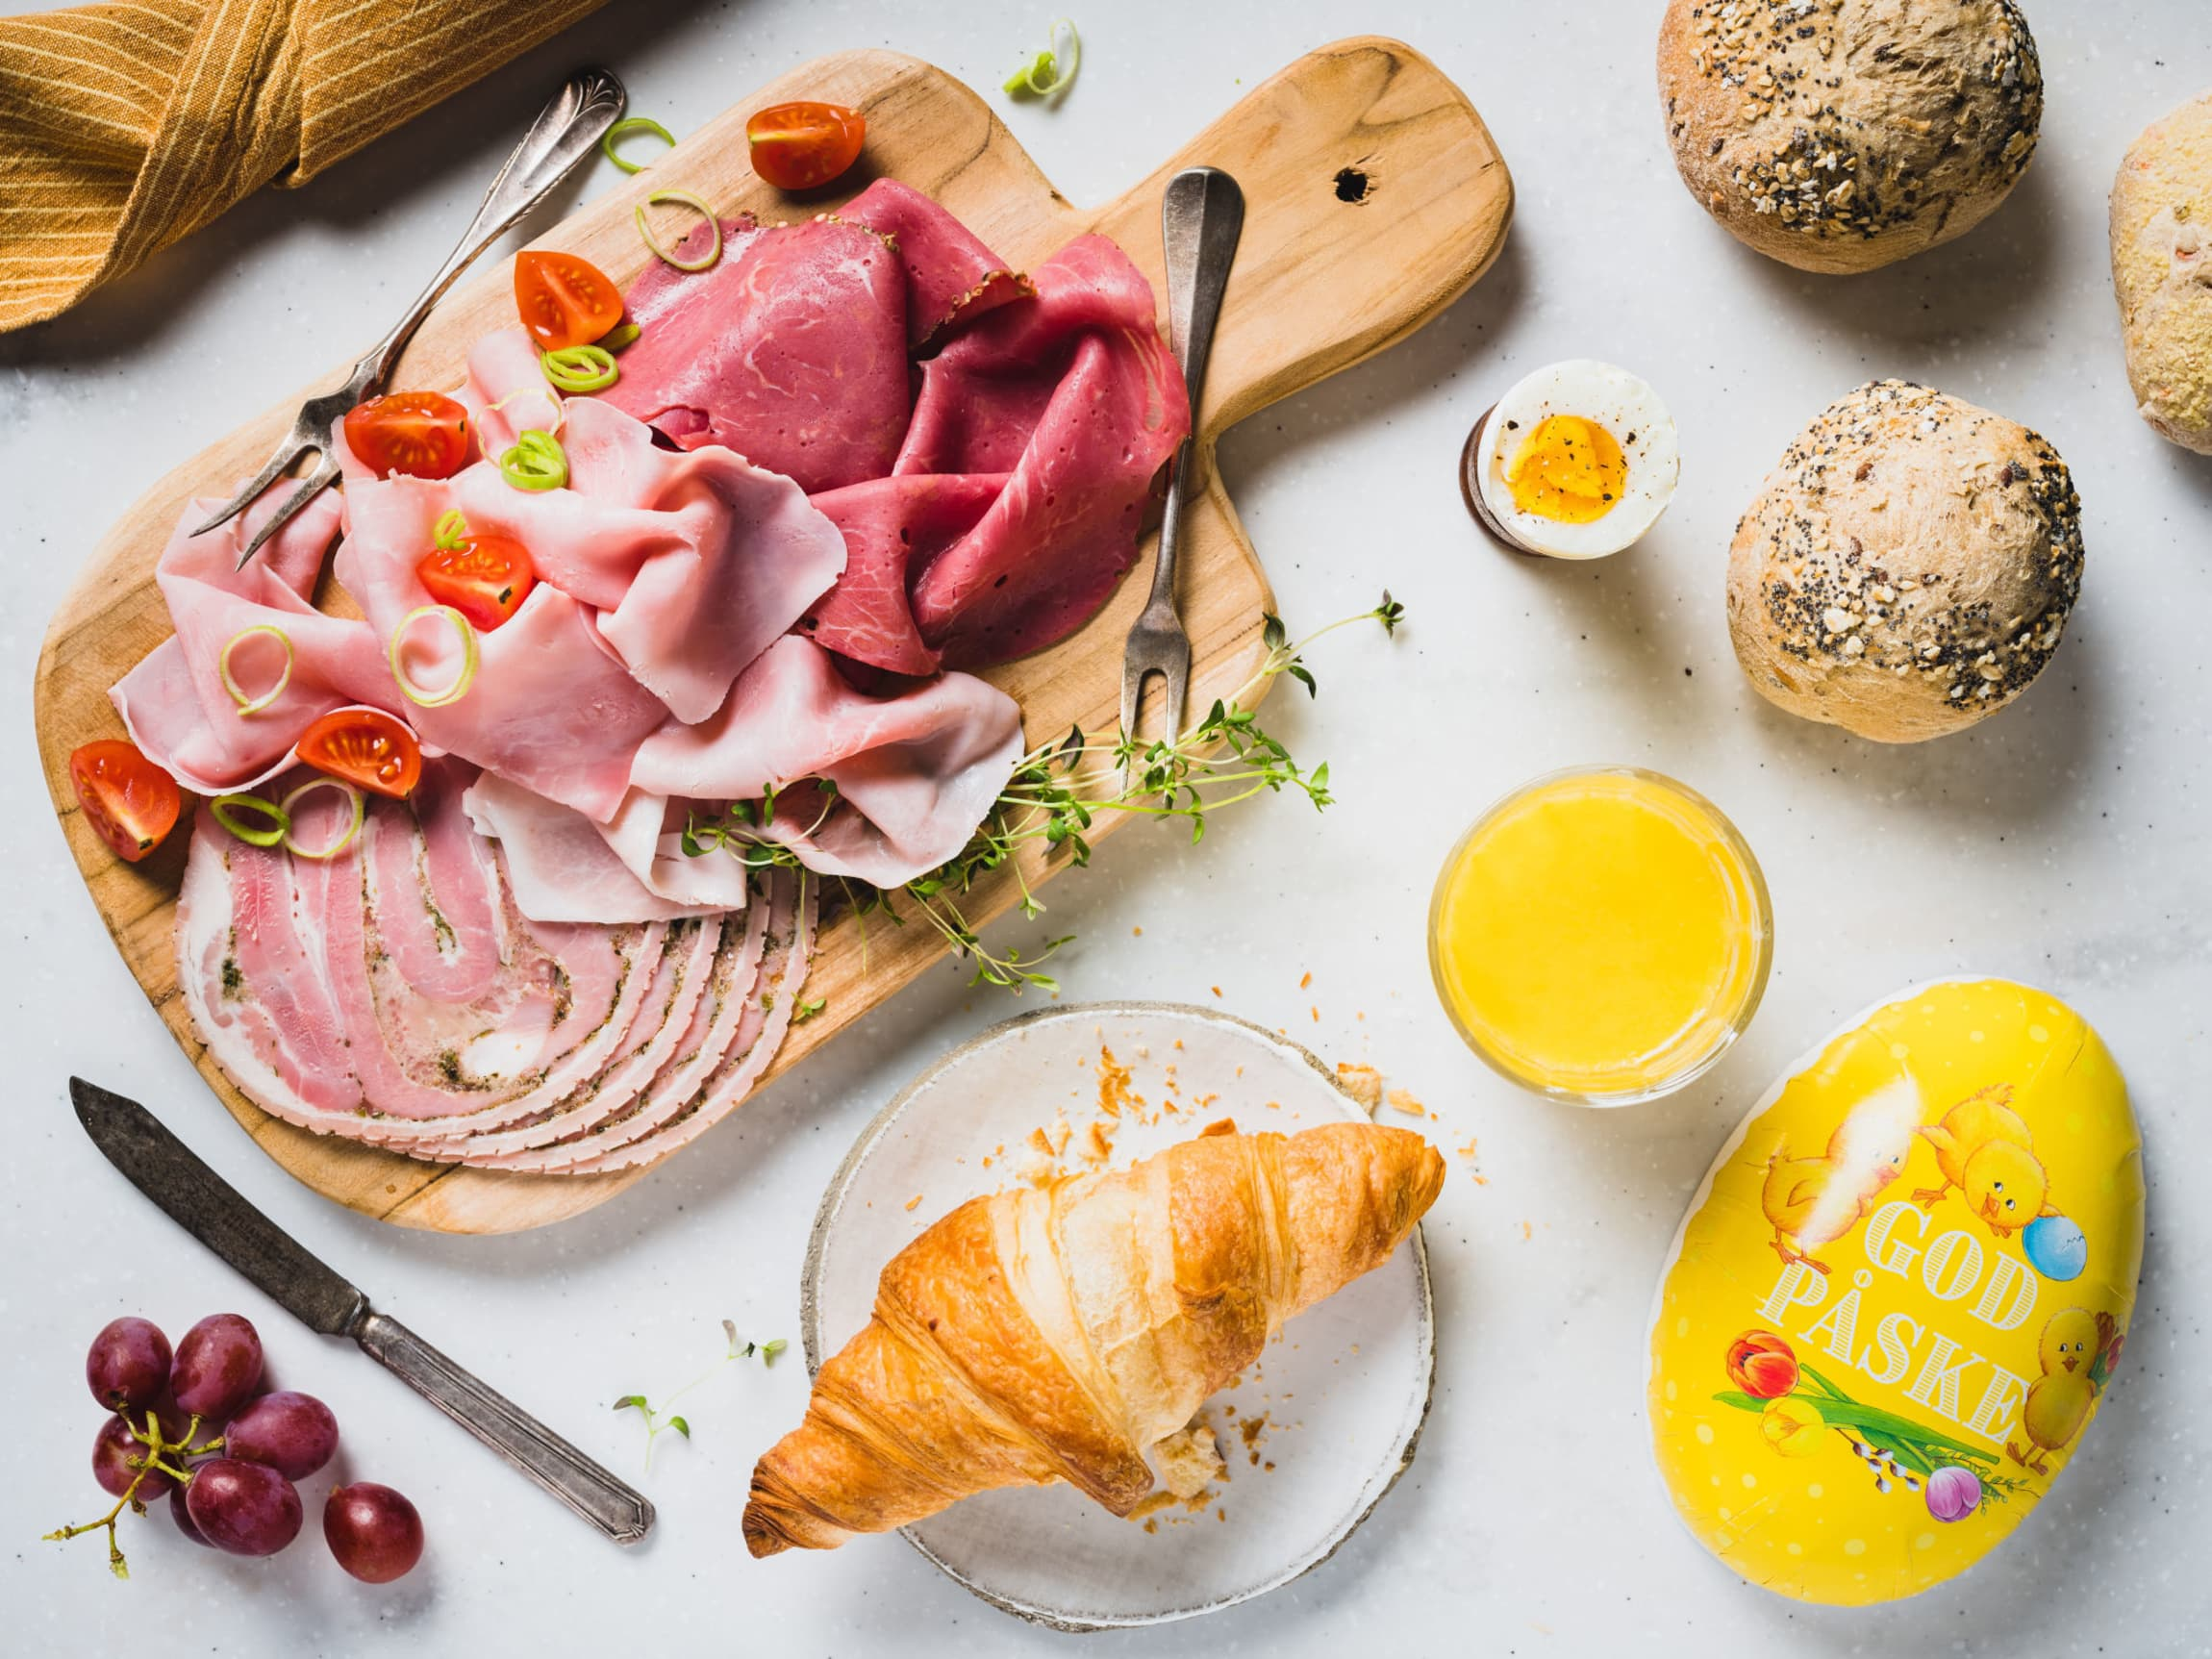 Slik lager du en god påskefrokost